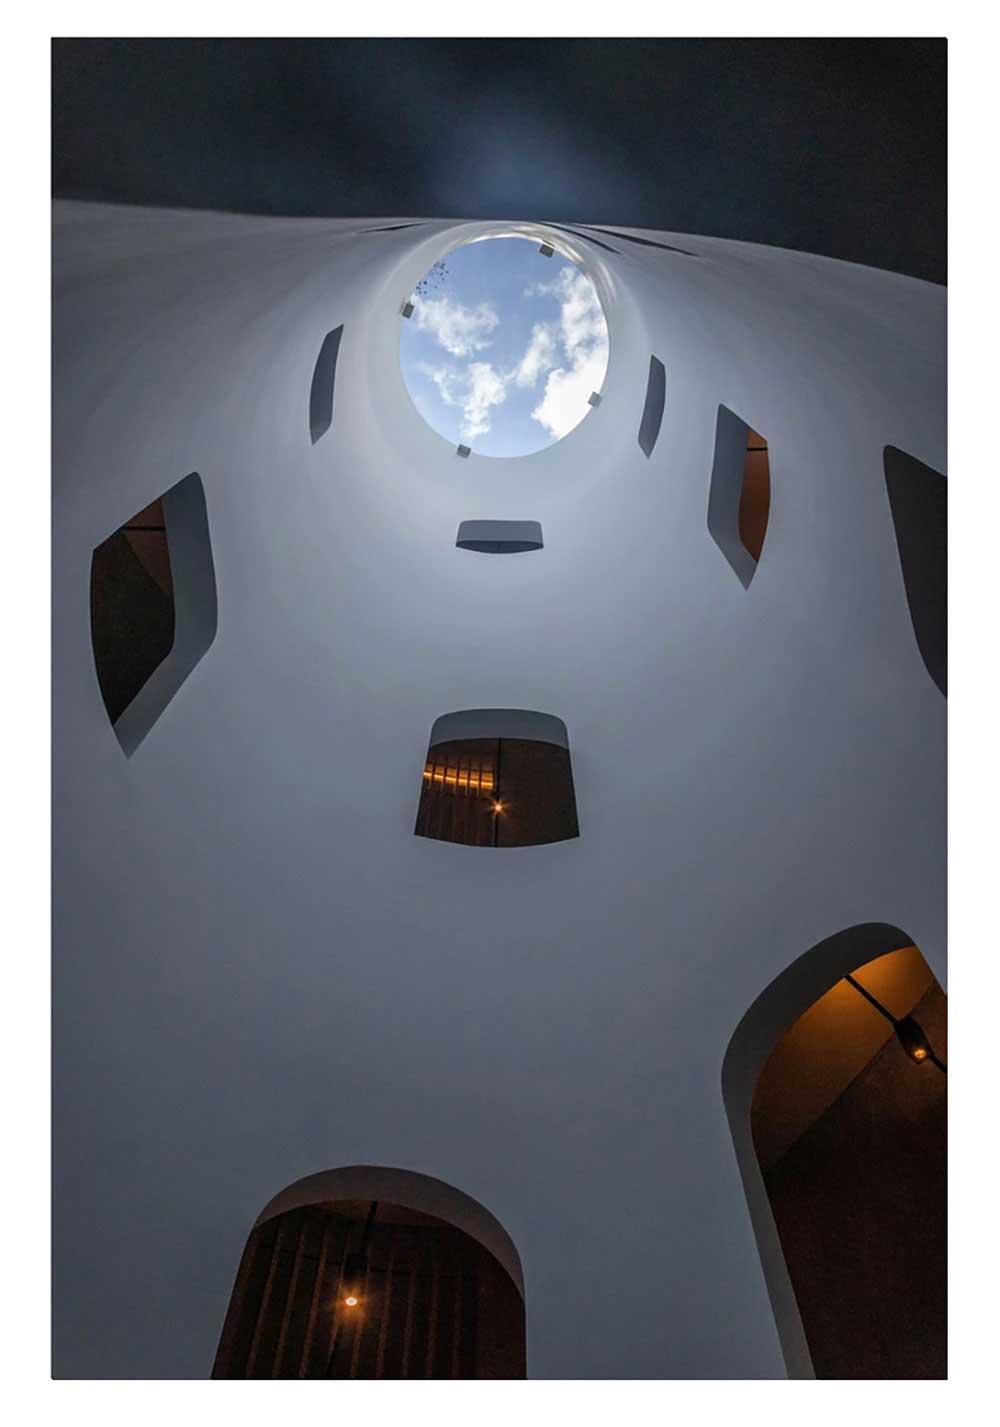 Euphoria Retreat light well by Deca Architecture, Mystras, Corley Kotler